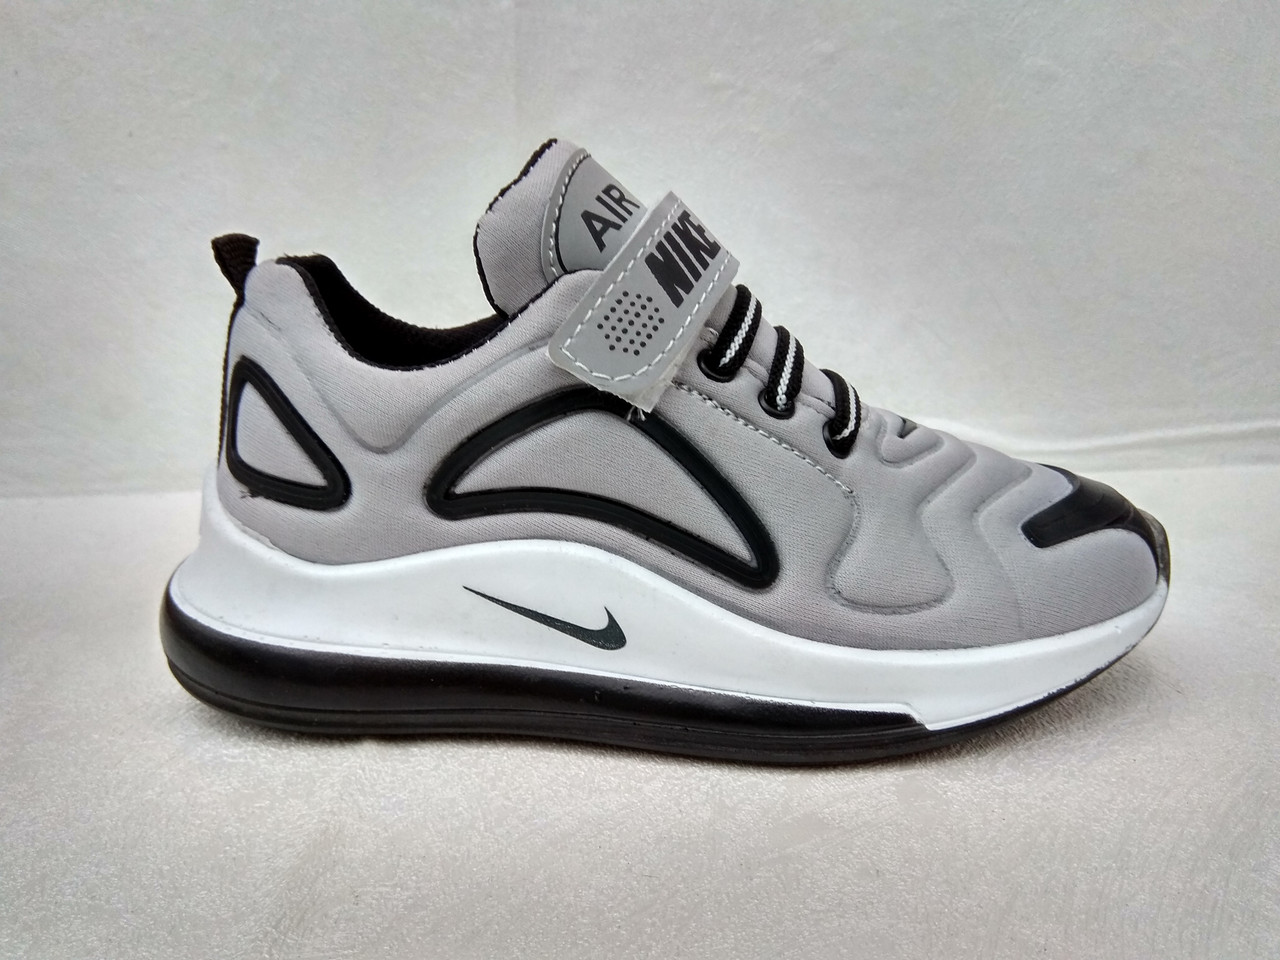 4aedd12b1 Детские кроссовки Nike оптом N720 grey (р.31-35) Турция реплика ...